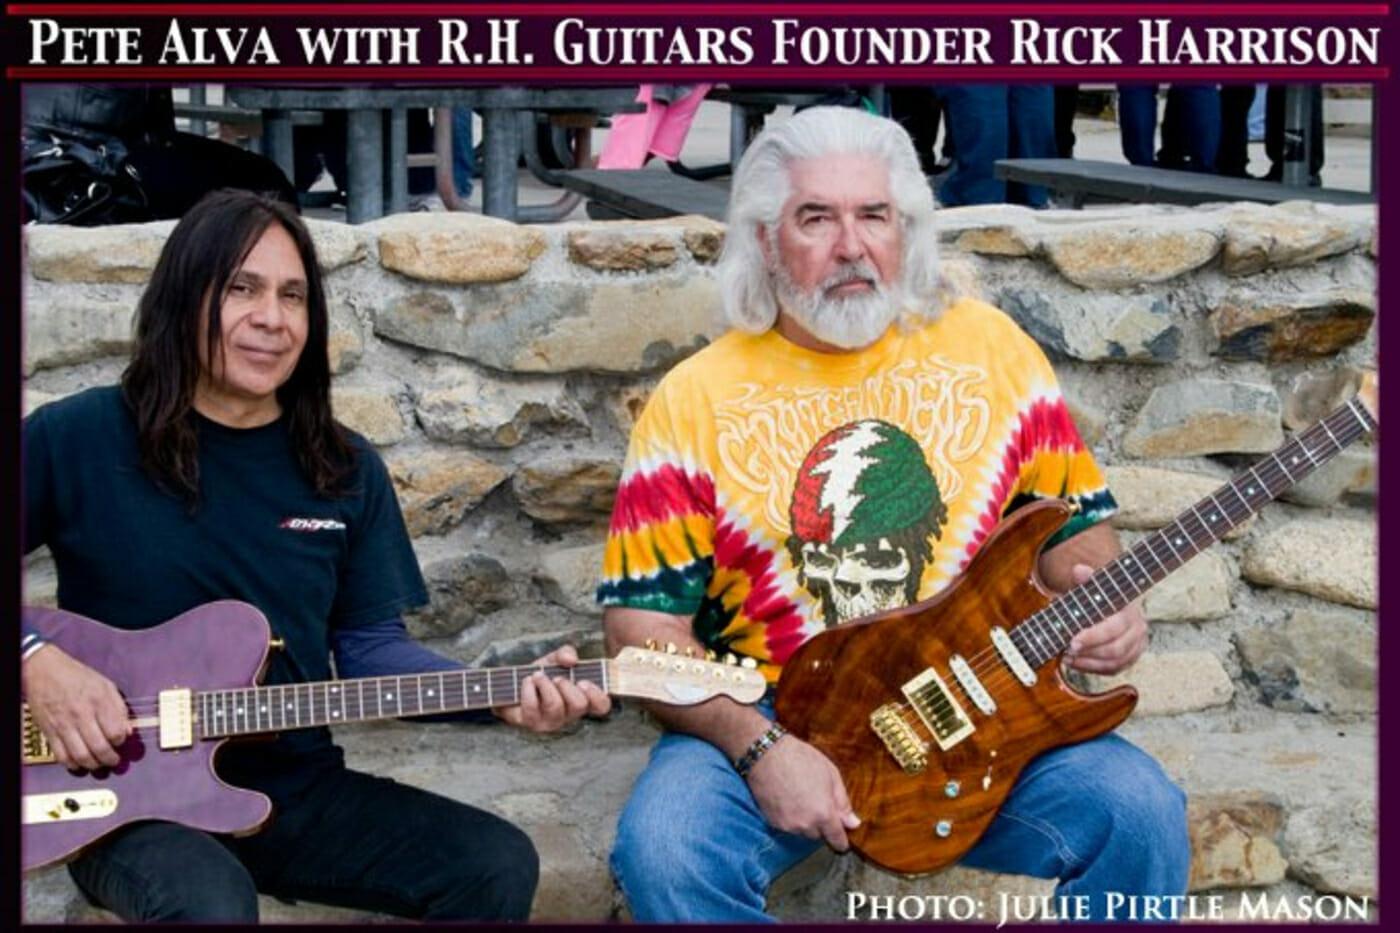 Pete Alva with RH Custom Guitars Founder Rick Harrison